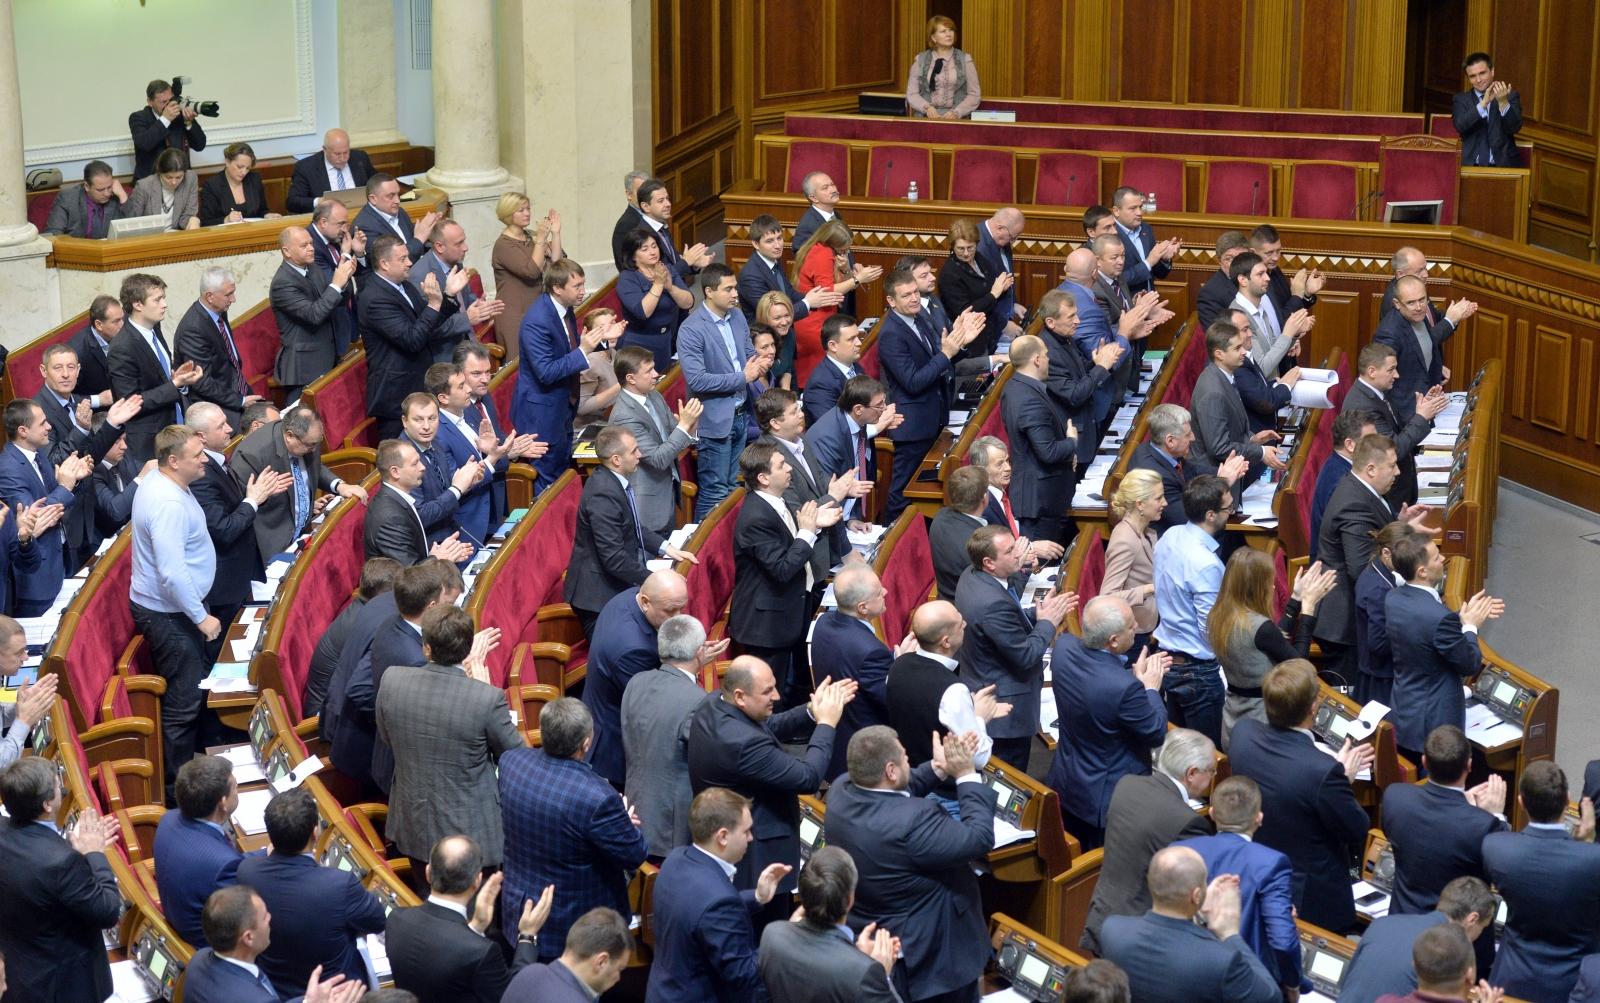 Ukraine Nato Non-aligned status vote kiev